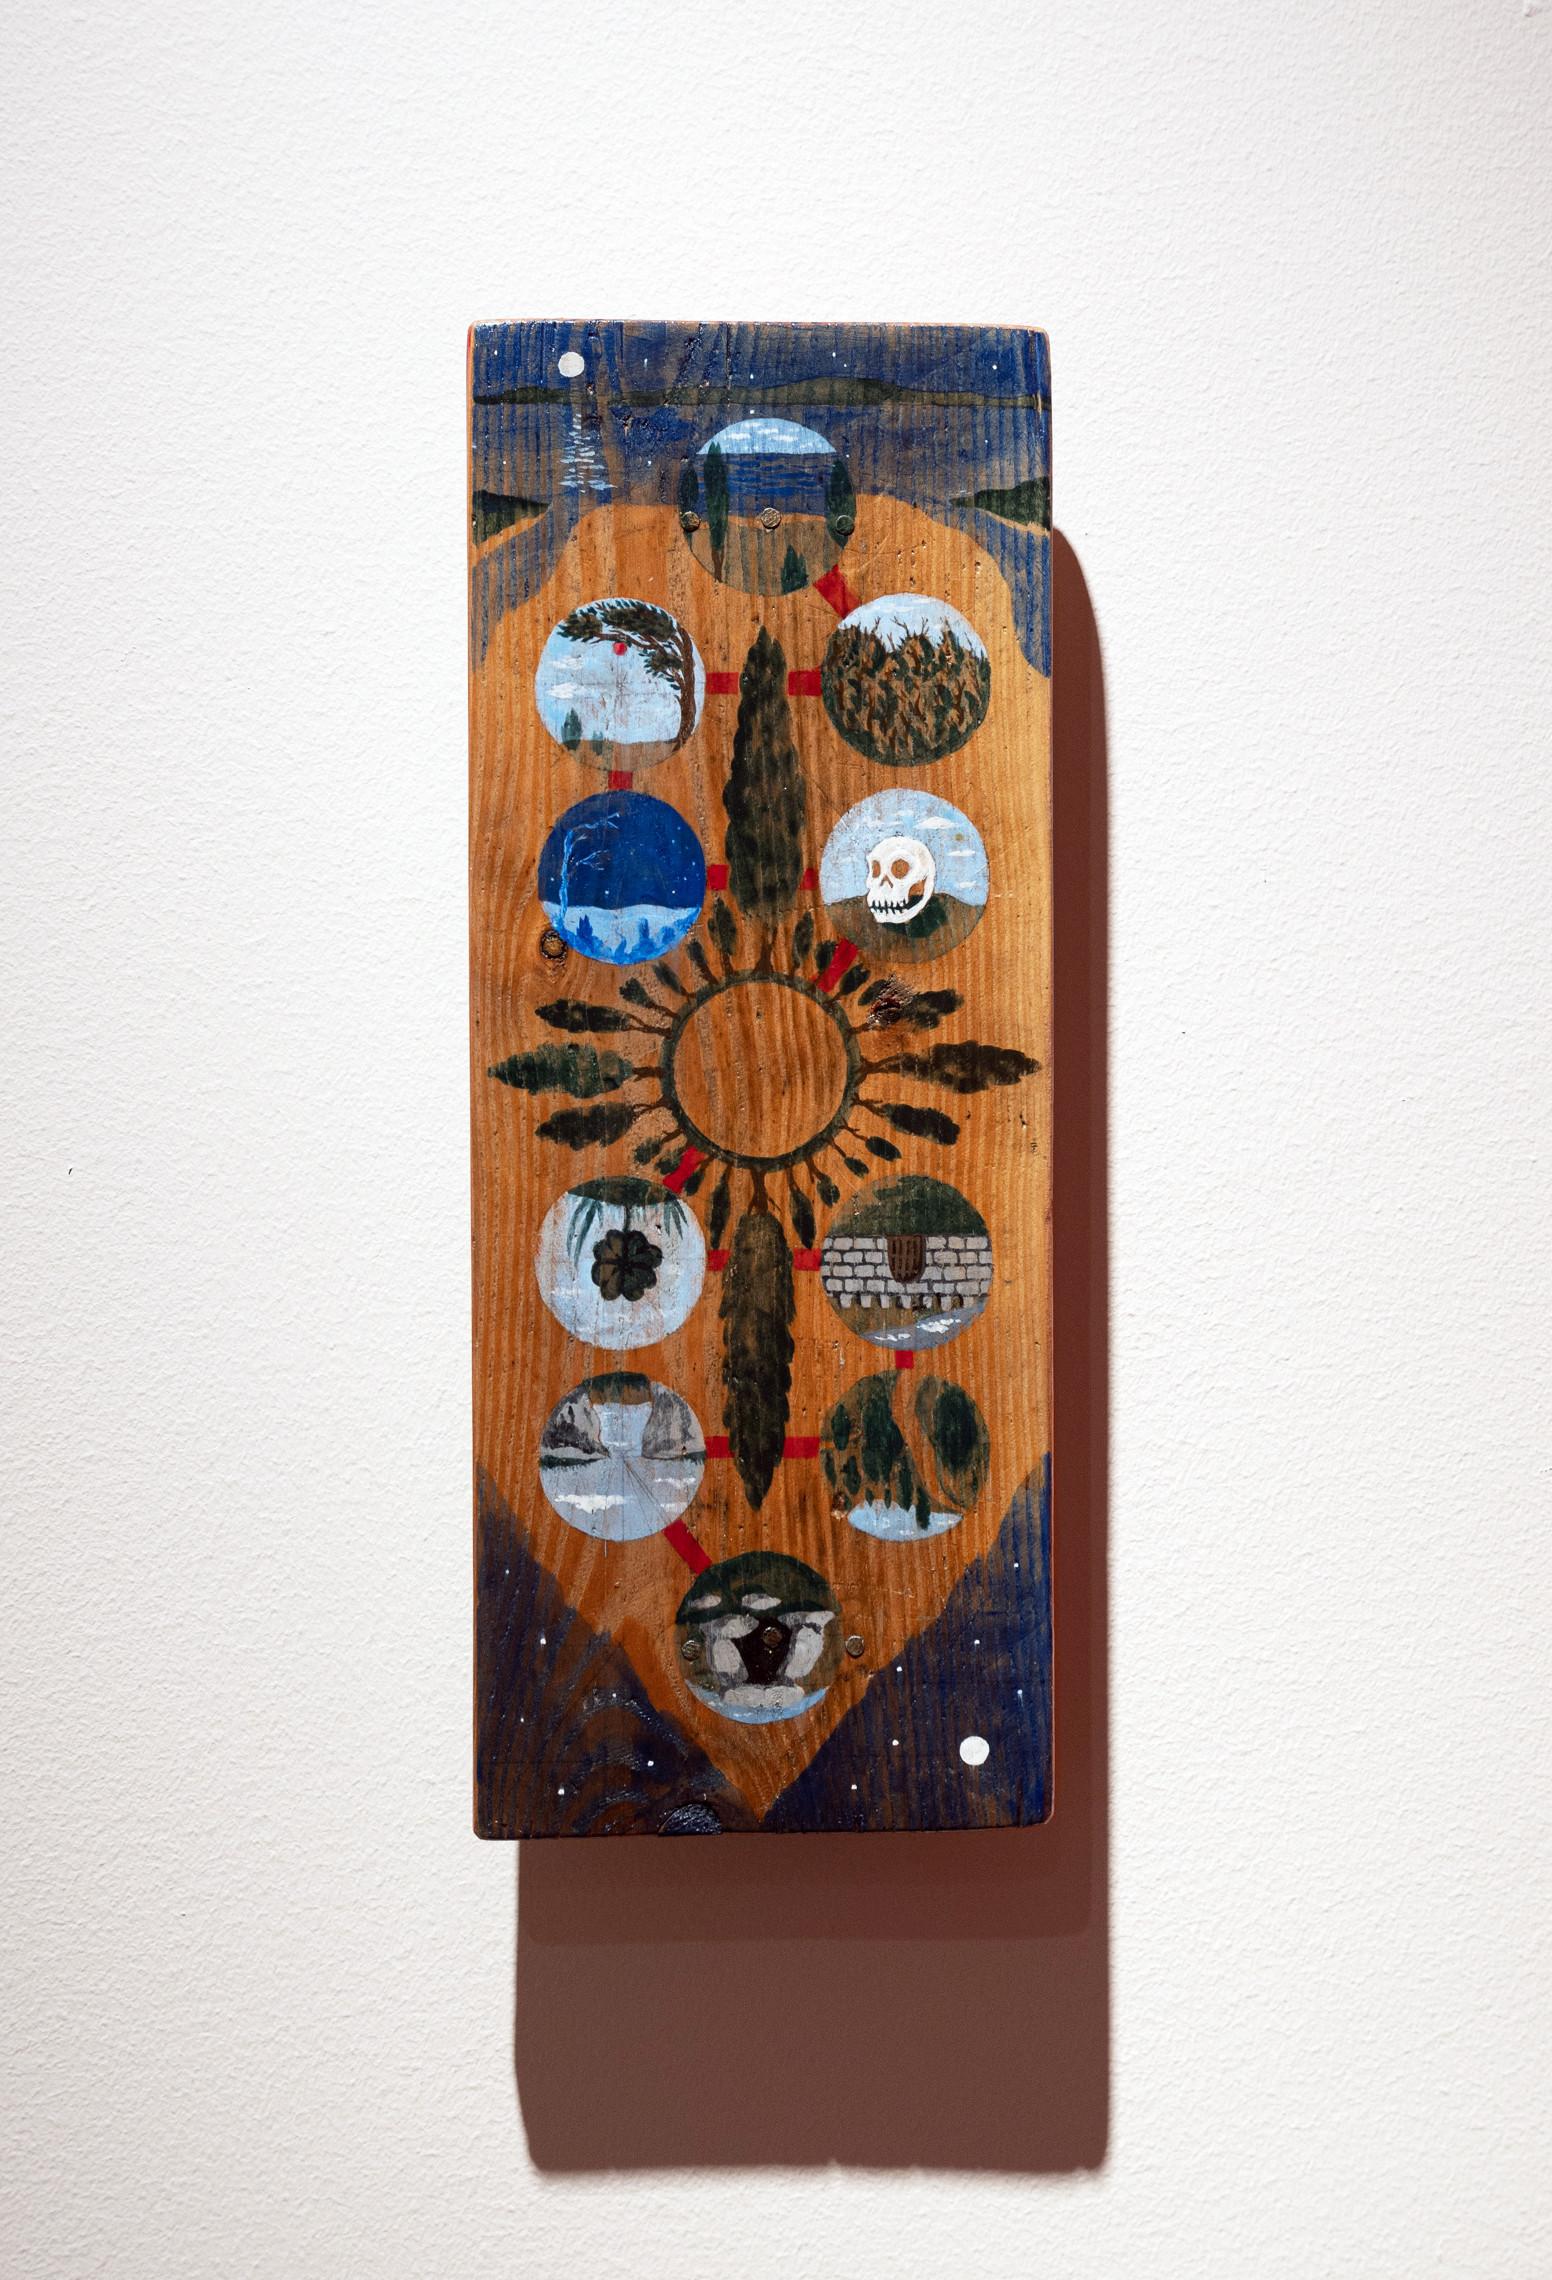 Albin Werle Under Himlens Alla Stjärnor, 2020 Gouache on wood, lacquer 14x36x4 cm